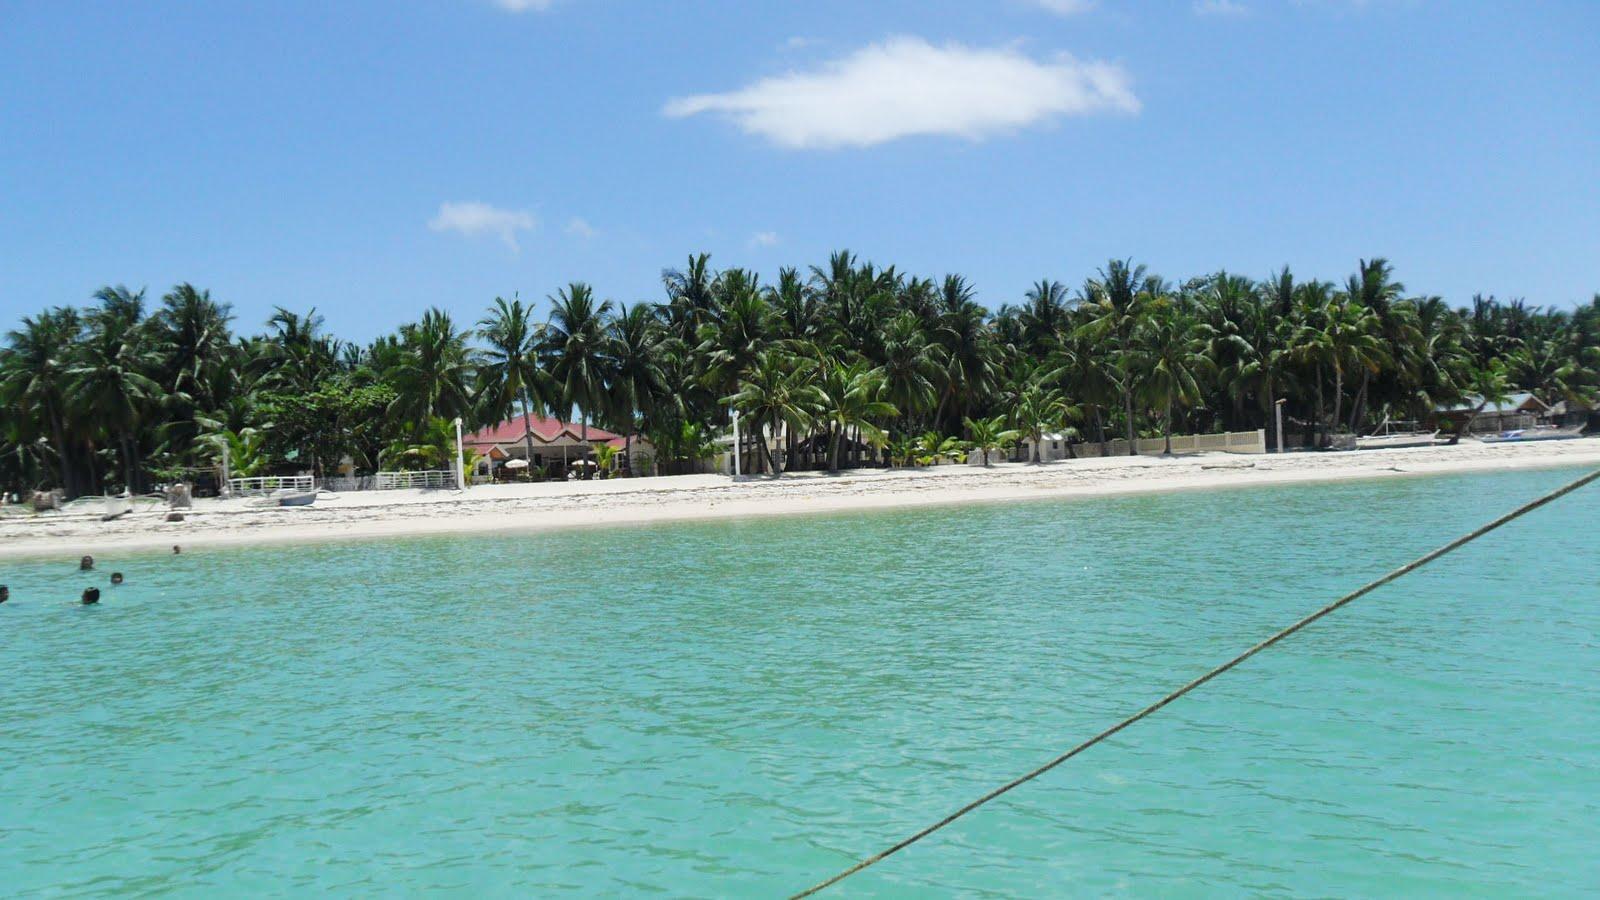 cebu image island hotels travel destination and  sta fe beach resort bantayan island #12